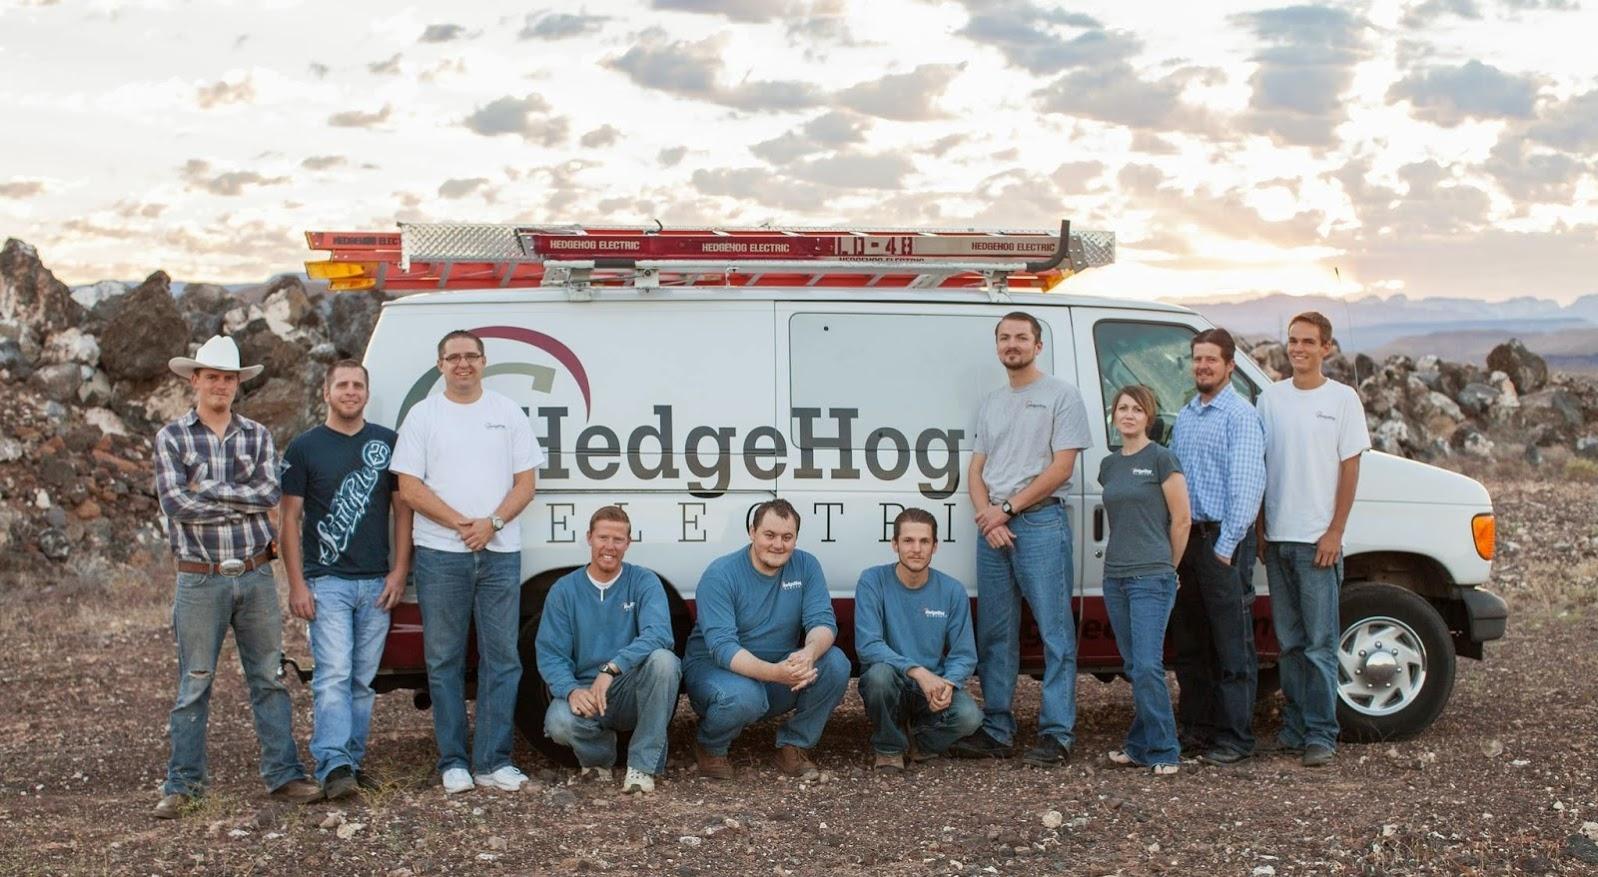 HedgeHog Electric image 0